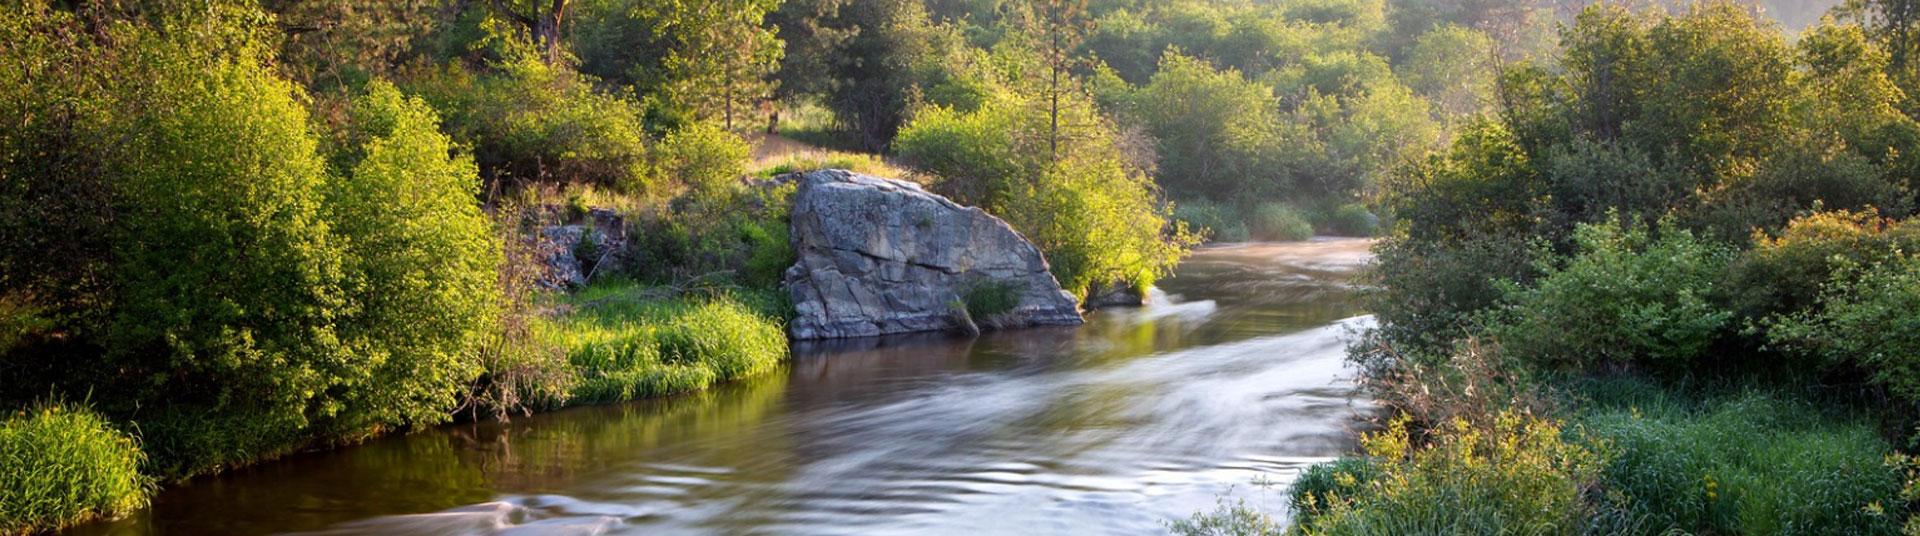 hero image- Little Spokane River